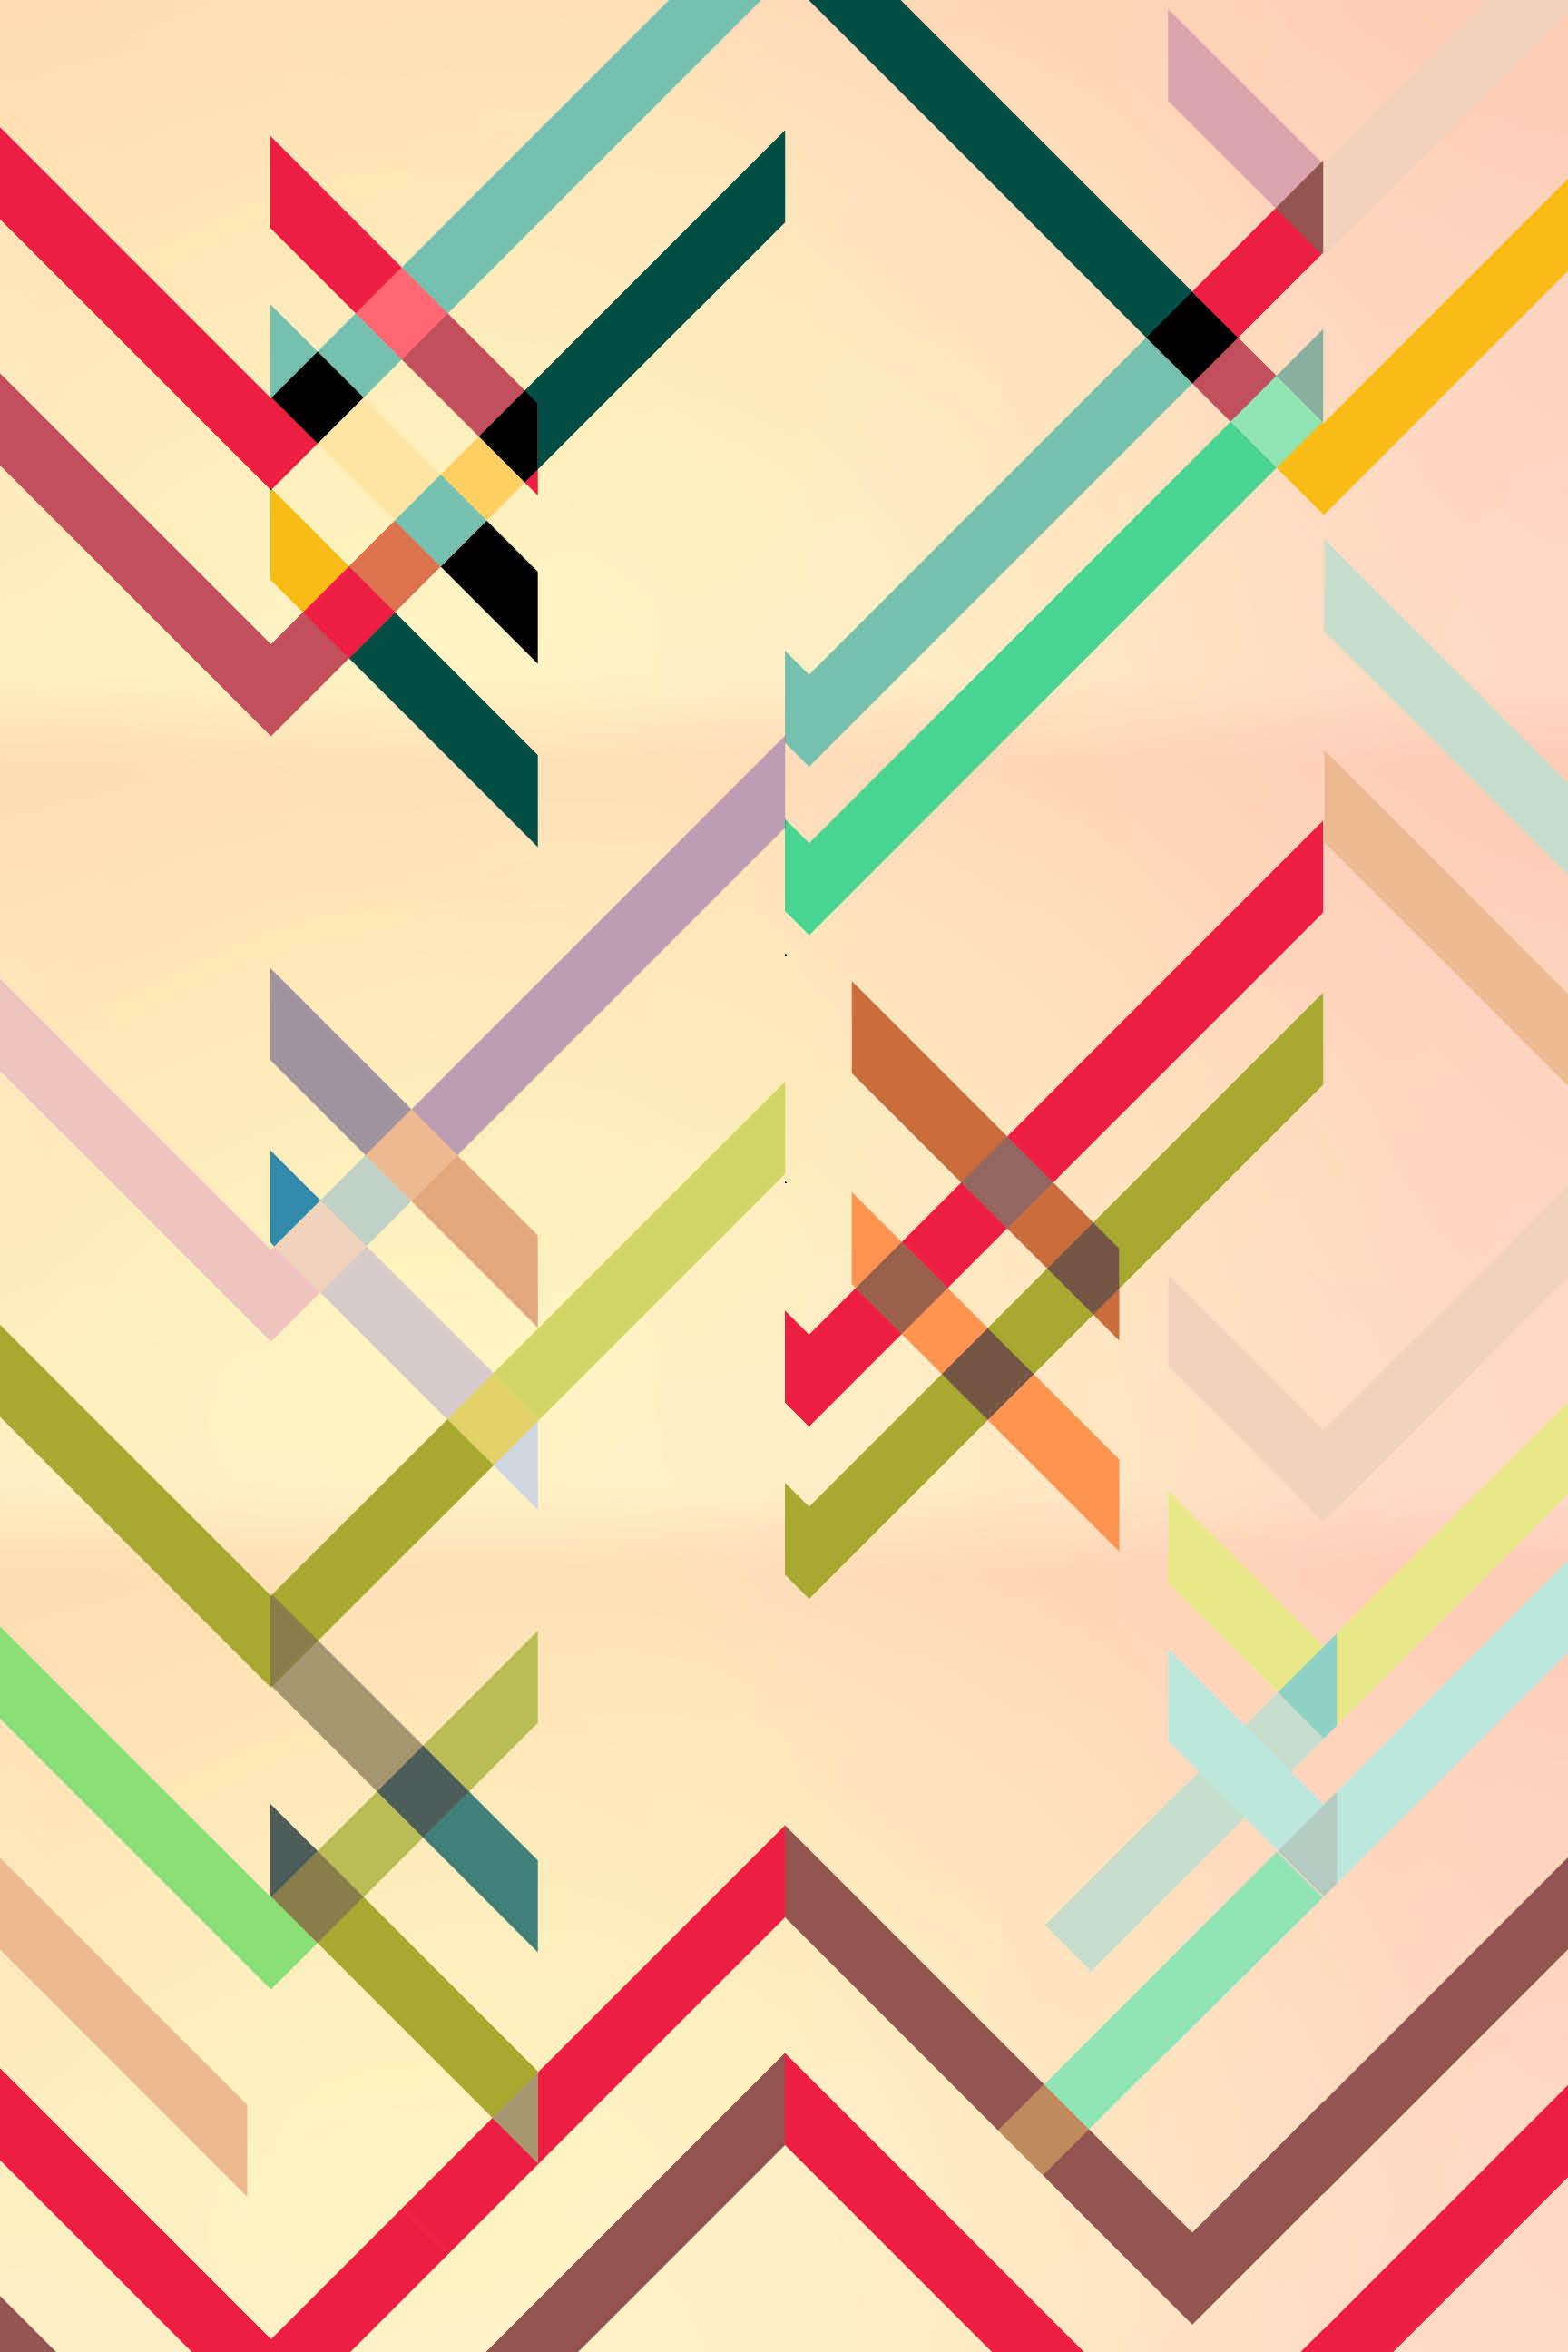 GiftGuide_24x36_Pattern 1.jpg